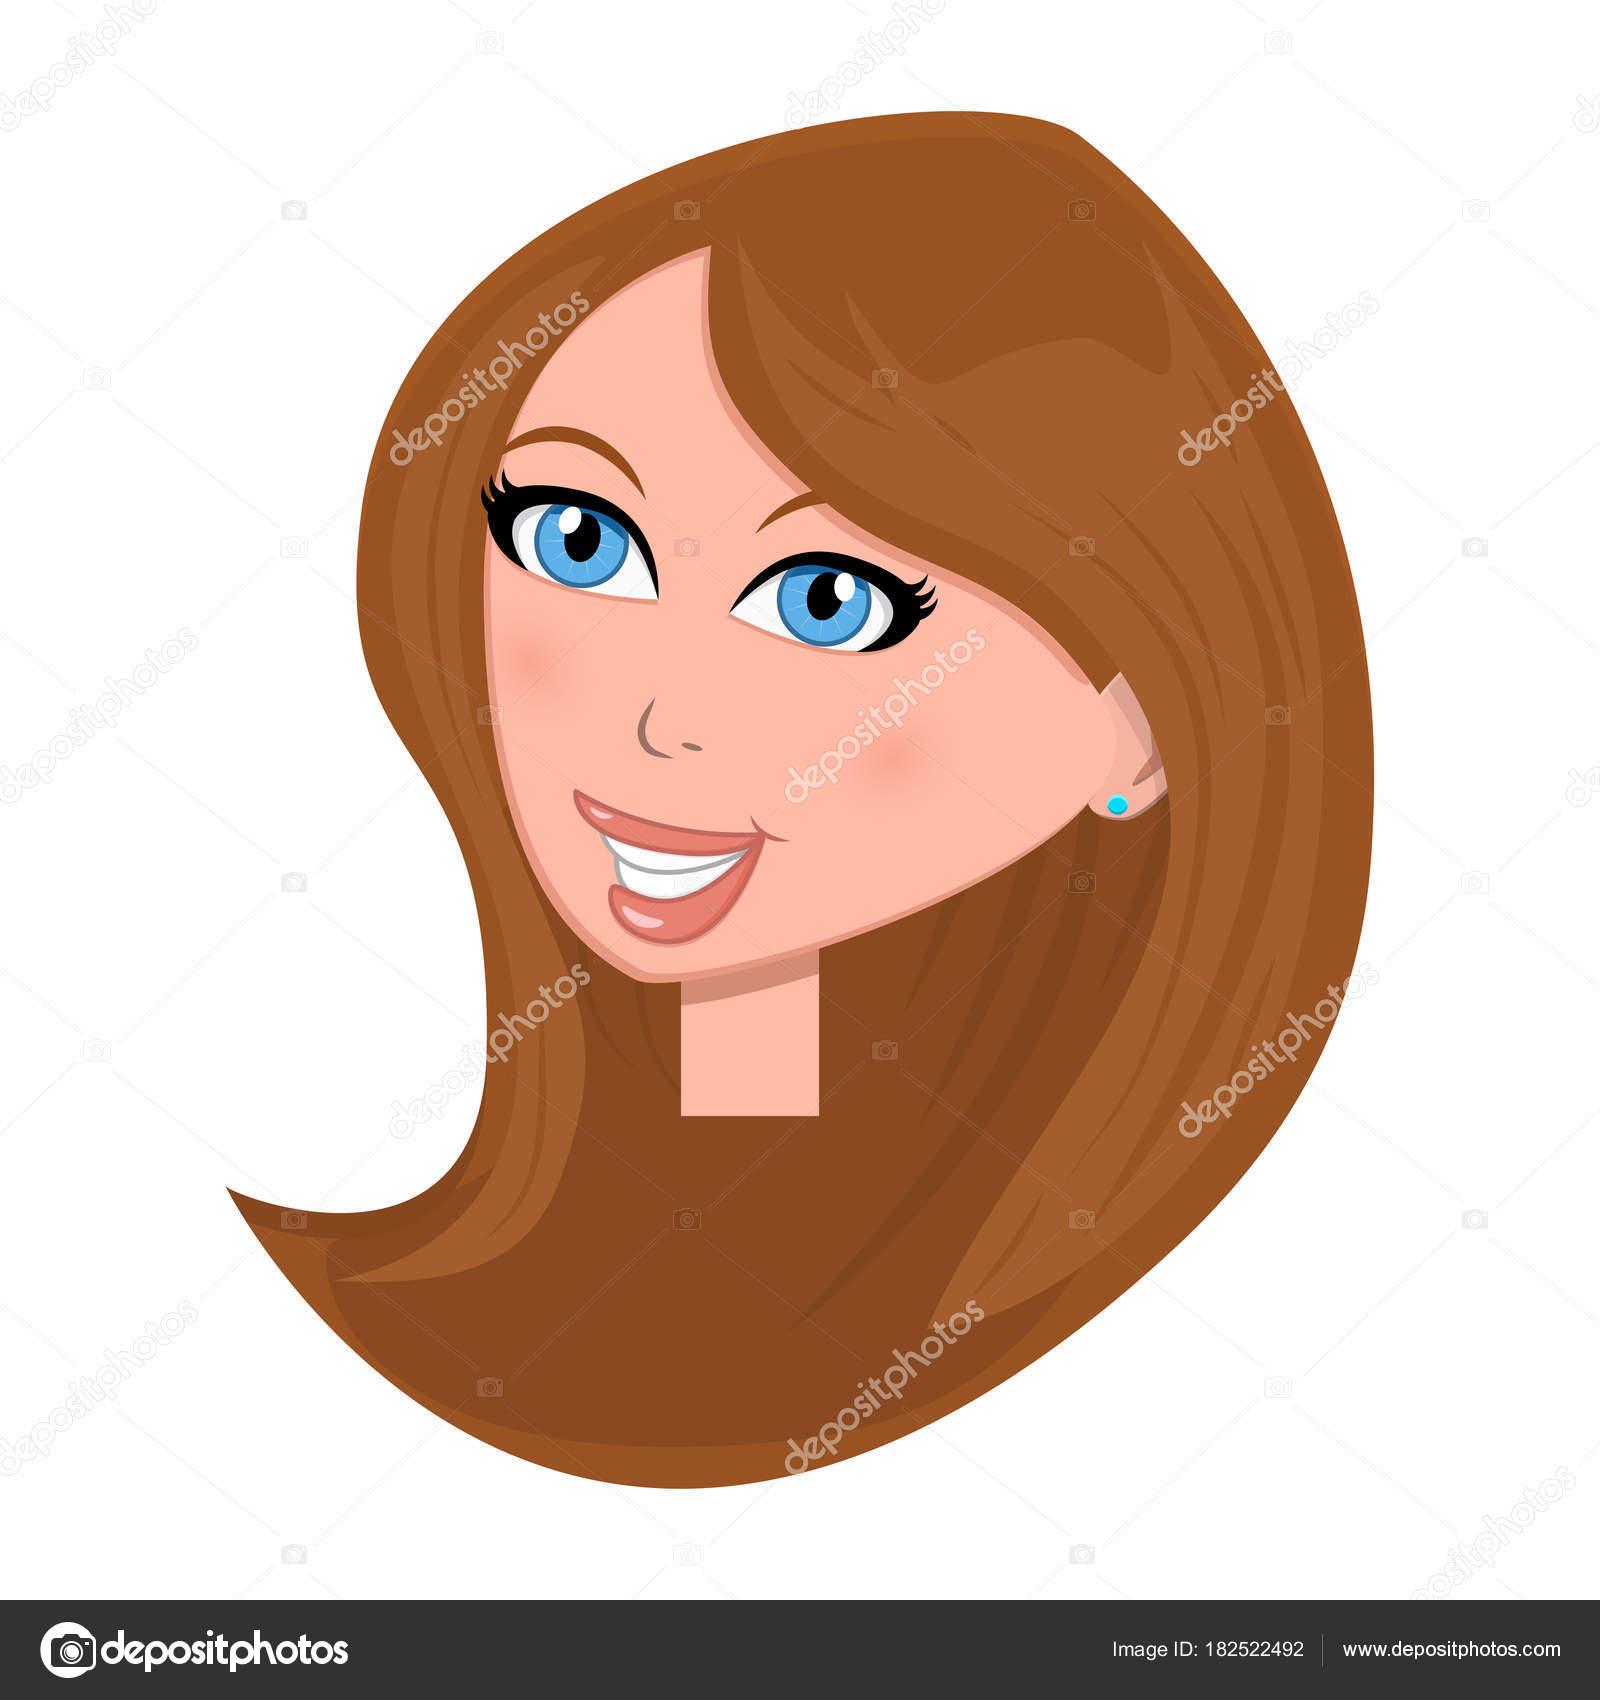 Woman Face Cartoon Illustration Isolated On White Background